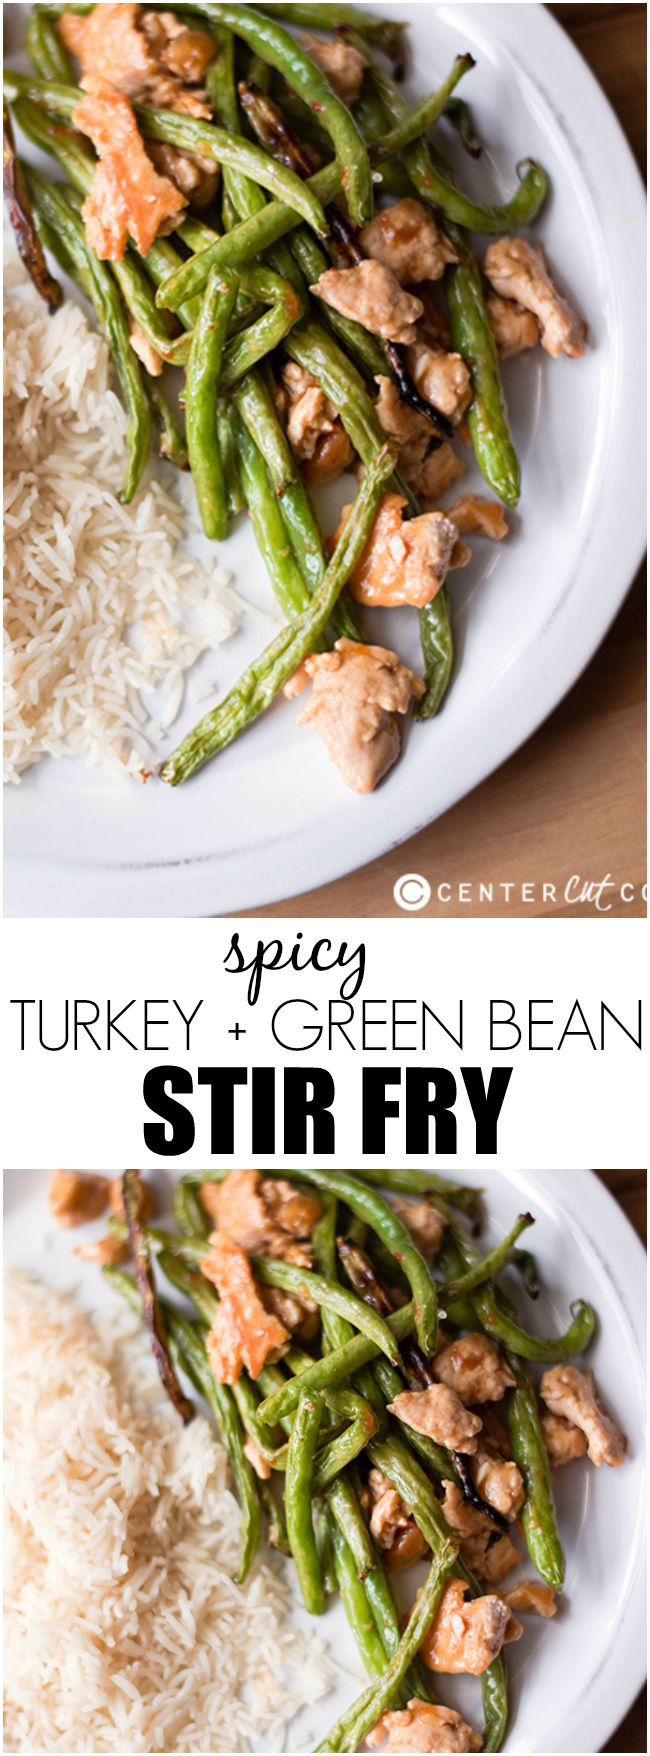 spicy turkey green bean stir fry pin